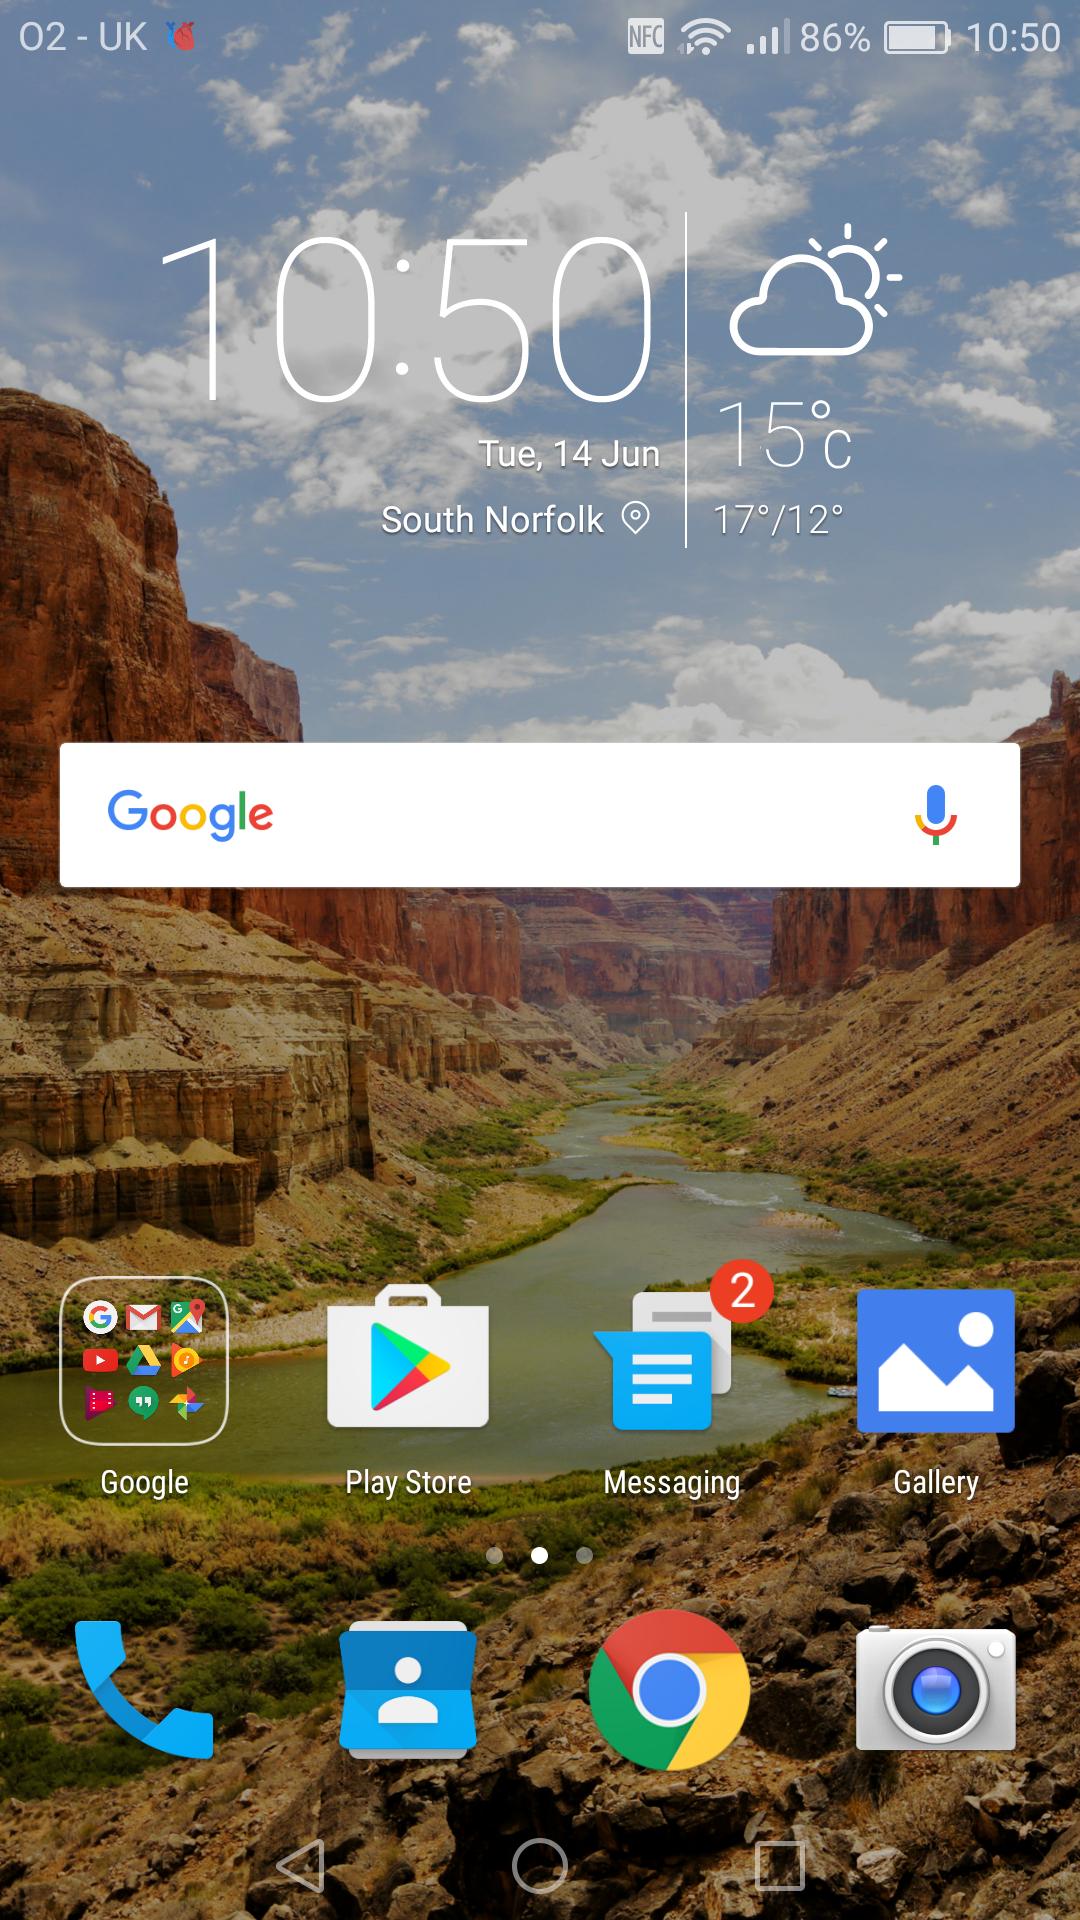 Google uk themes - Screenshot_2016 06 14 10 50 48 Png